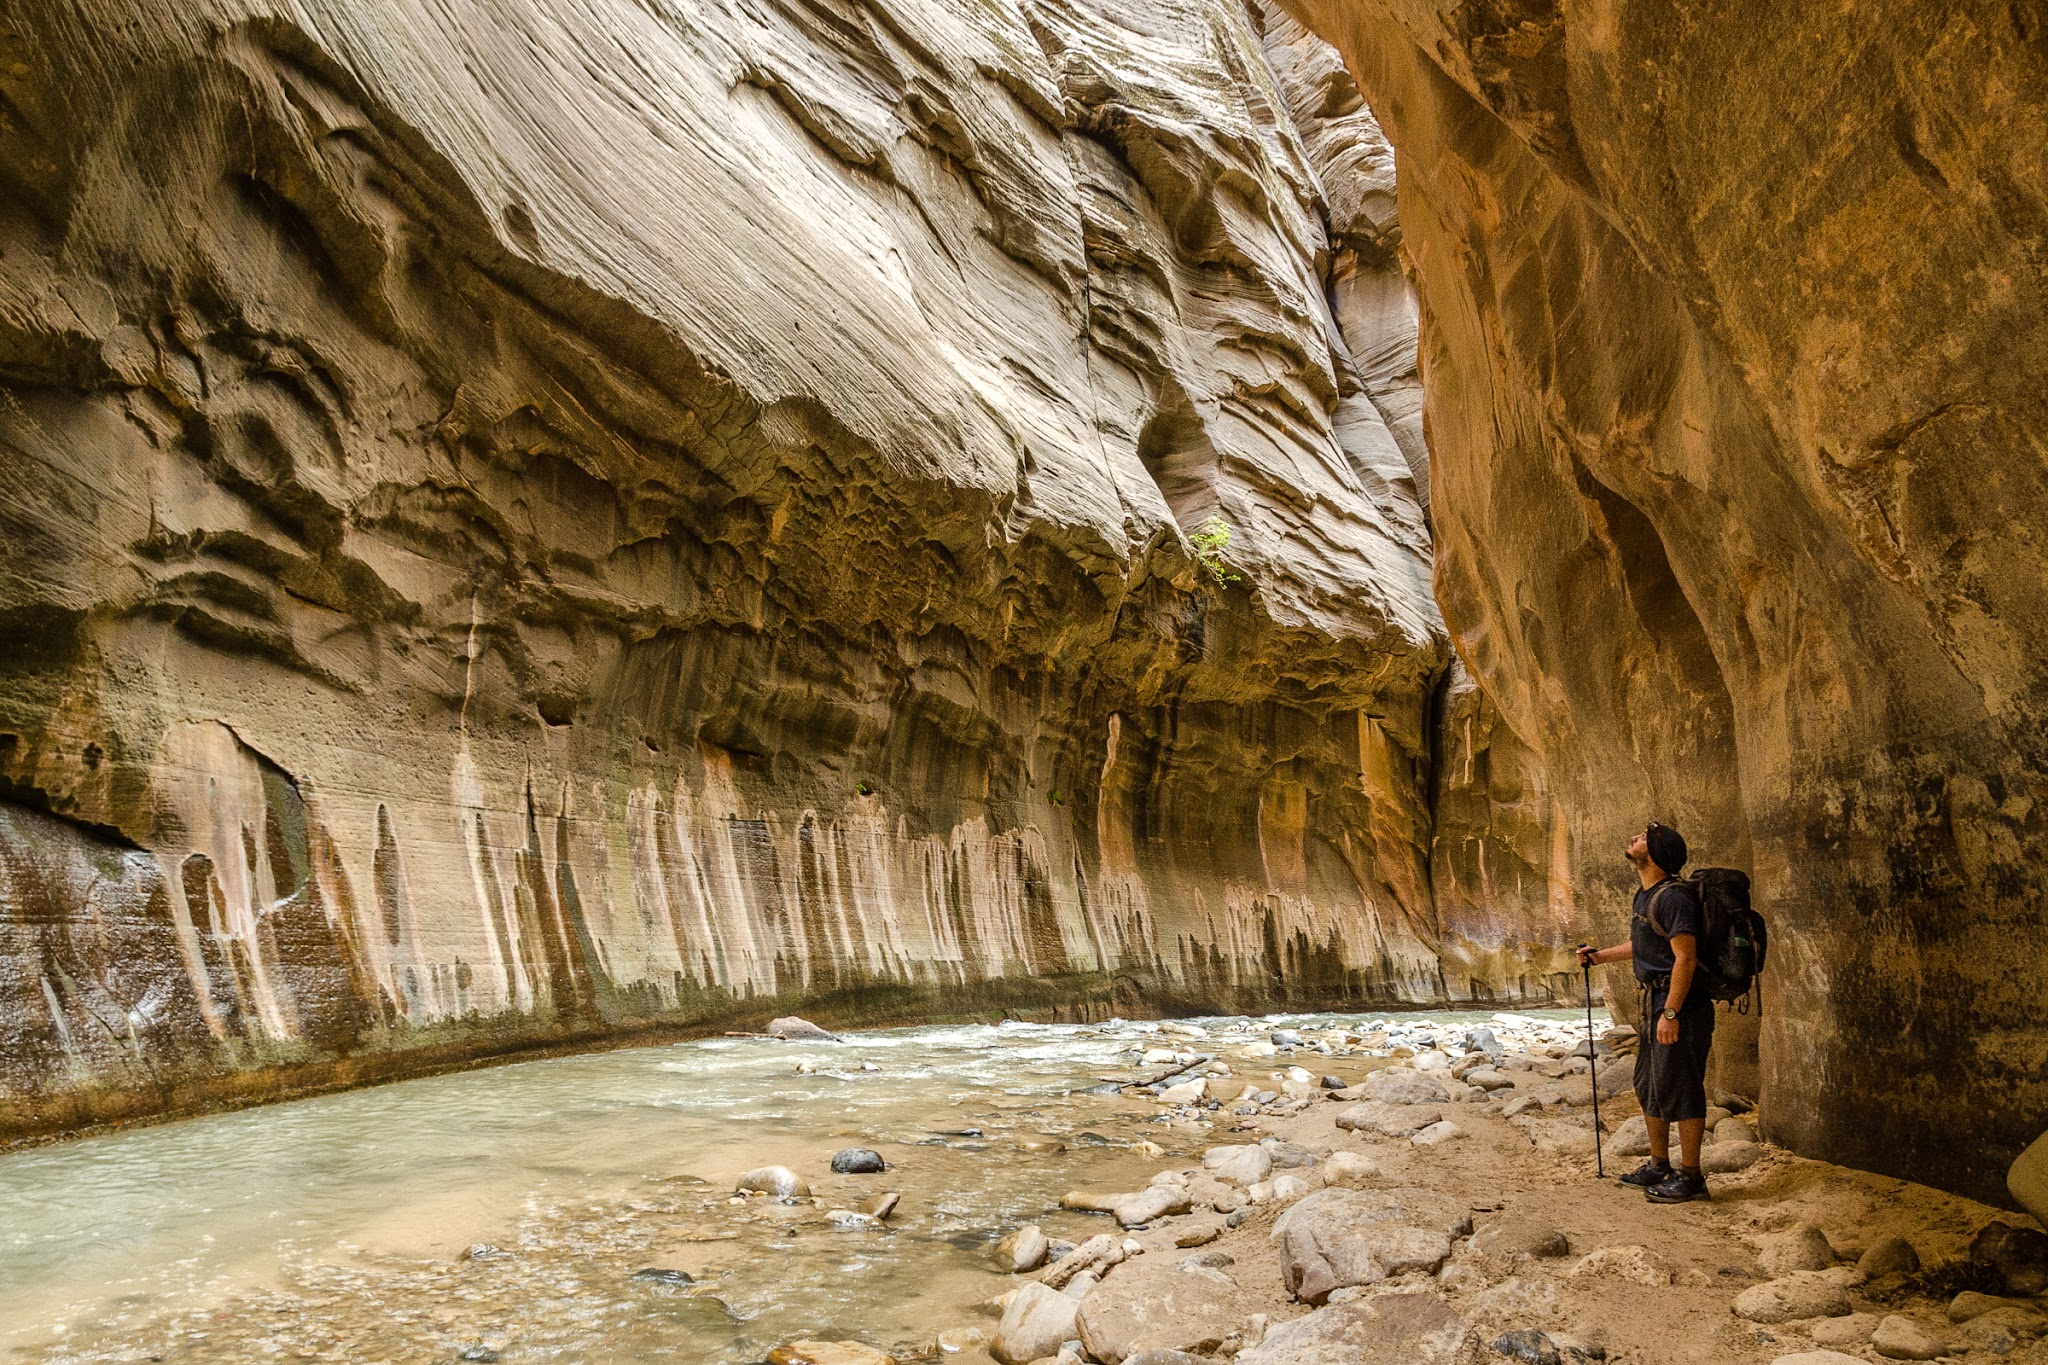 The Narrows. Zion National Park, Utah. Wasim Muklashy Photography